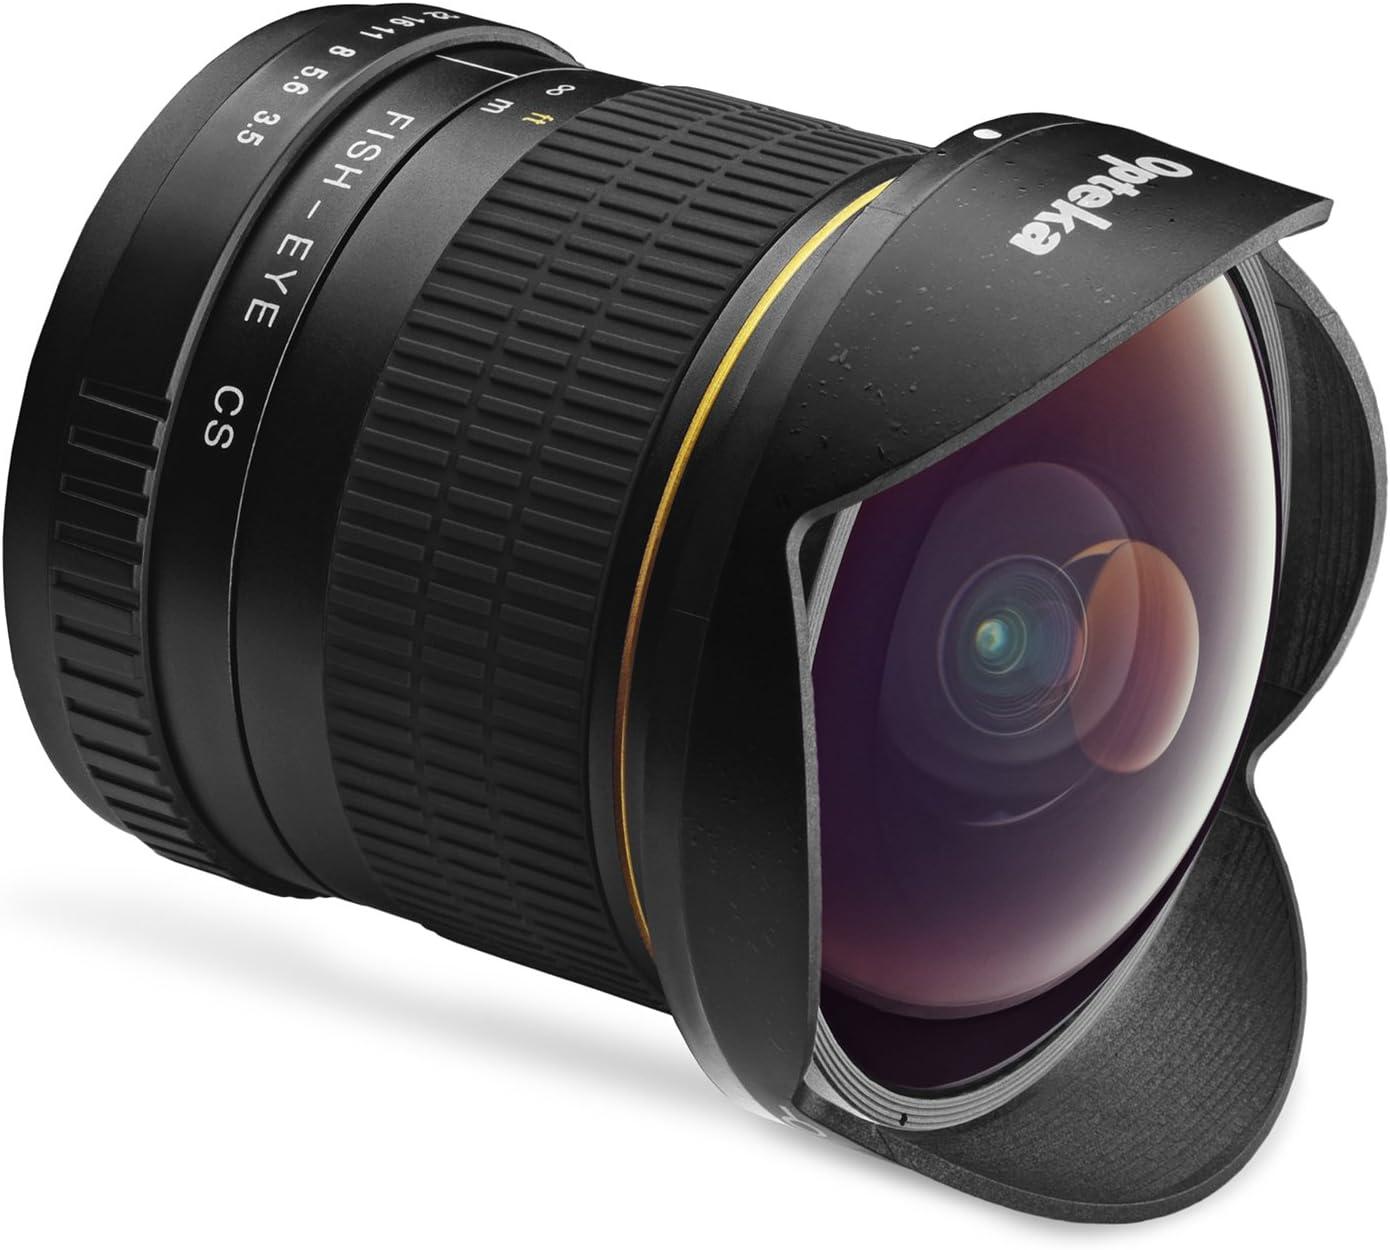 T7 T6 T6i T5i 7D T7s 77D T6s SL2 and SL1 Digital SLR Cameras 70D 60Da T5 60D Opteka 6.5mm f//3.5 HD Aspherical Fisheye Lens /& Removable Hood for Canon EOS 80D 50D T7i